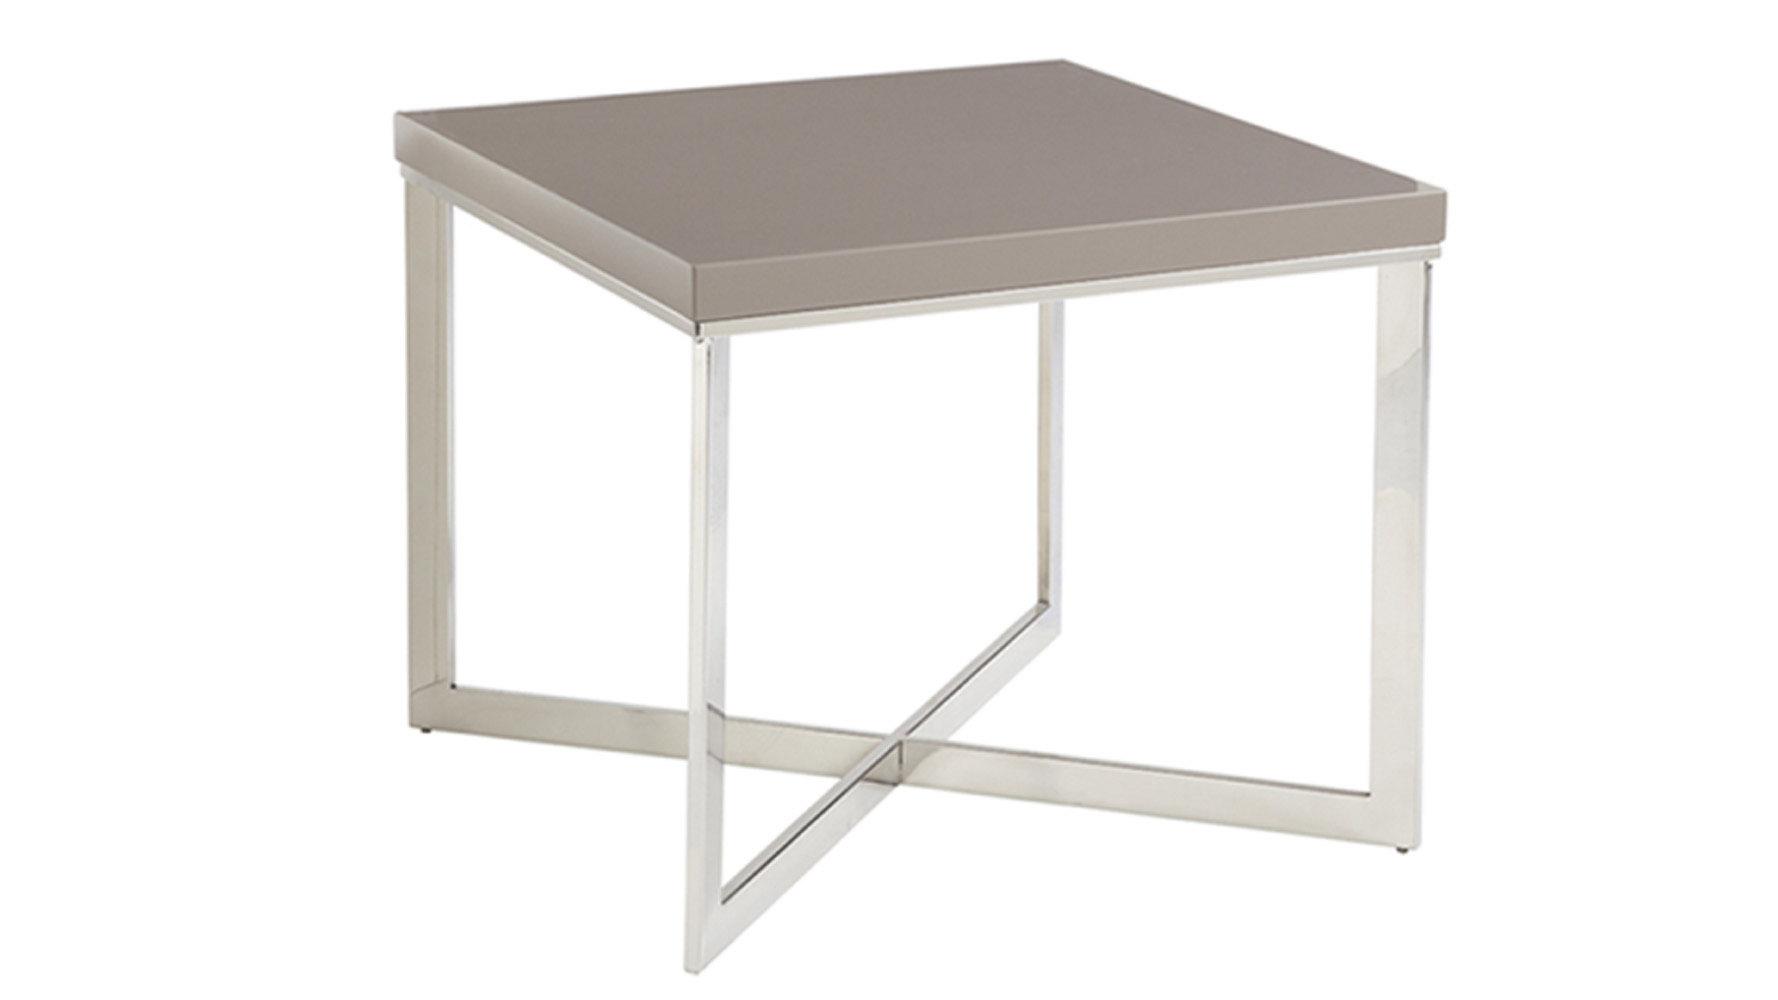 Pilot High Gloss Grey/Chrome Square End Table